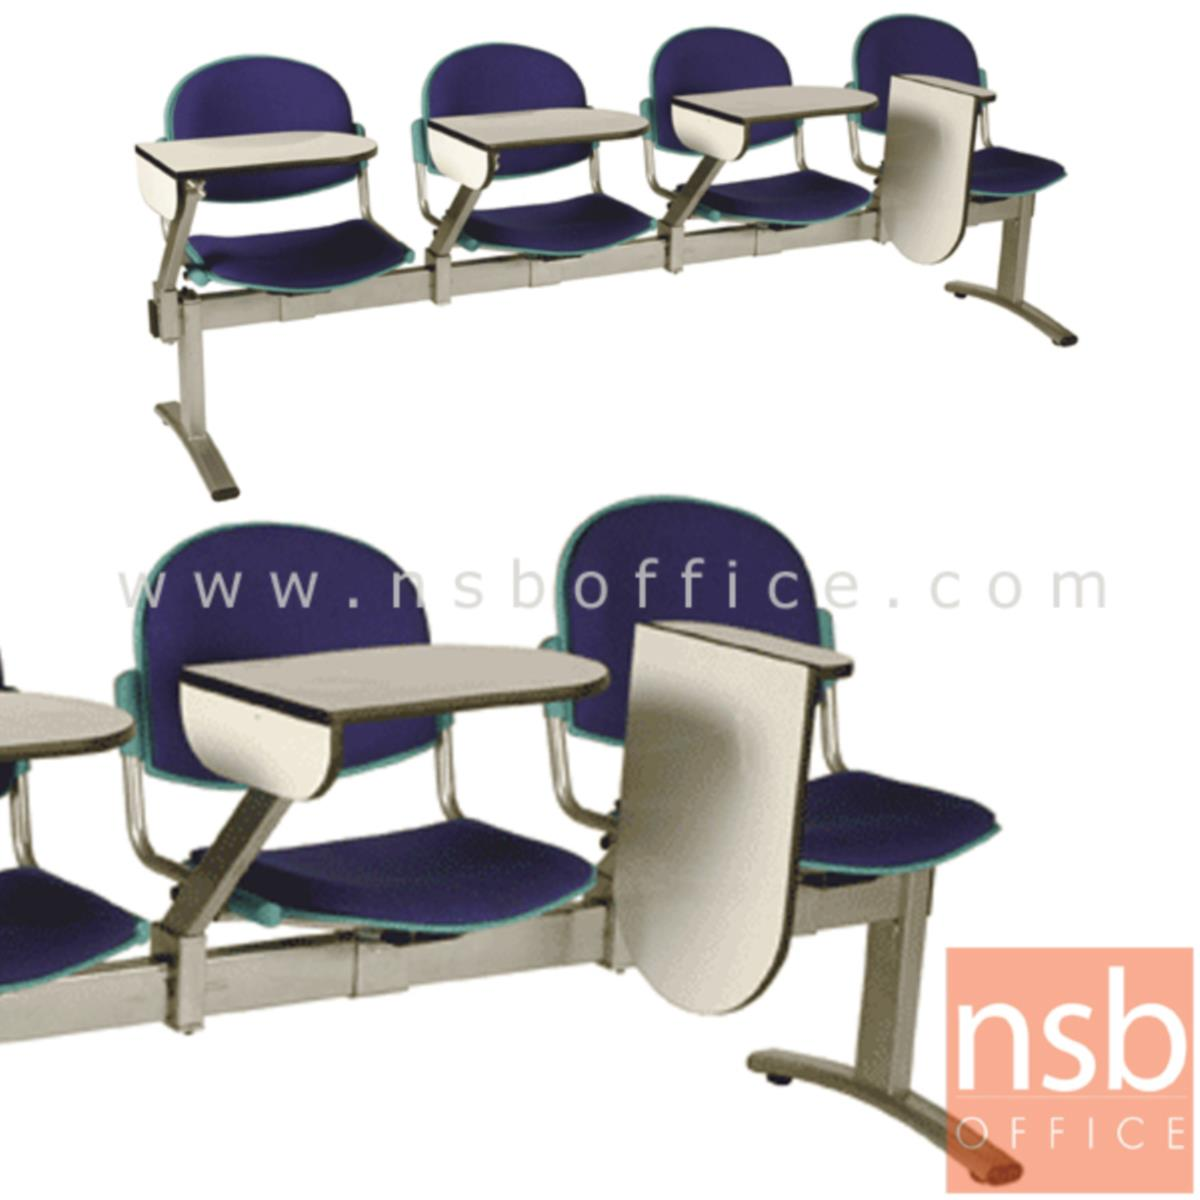 B17A022:เก้าอี้เลคเชอร์แถวเฟรมโพลี่หุ้มเบาะ รุ่น D756 2 ,3 และ 4 ที่นั่ง ขาเหล็กพ่นสีเทา